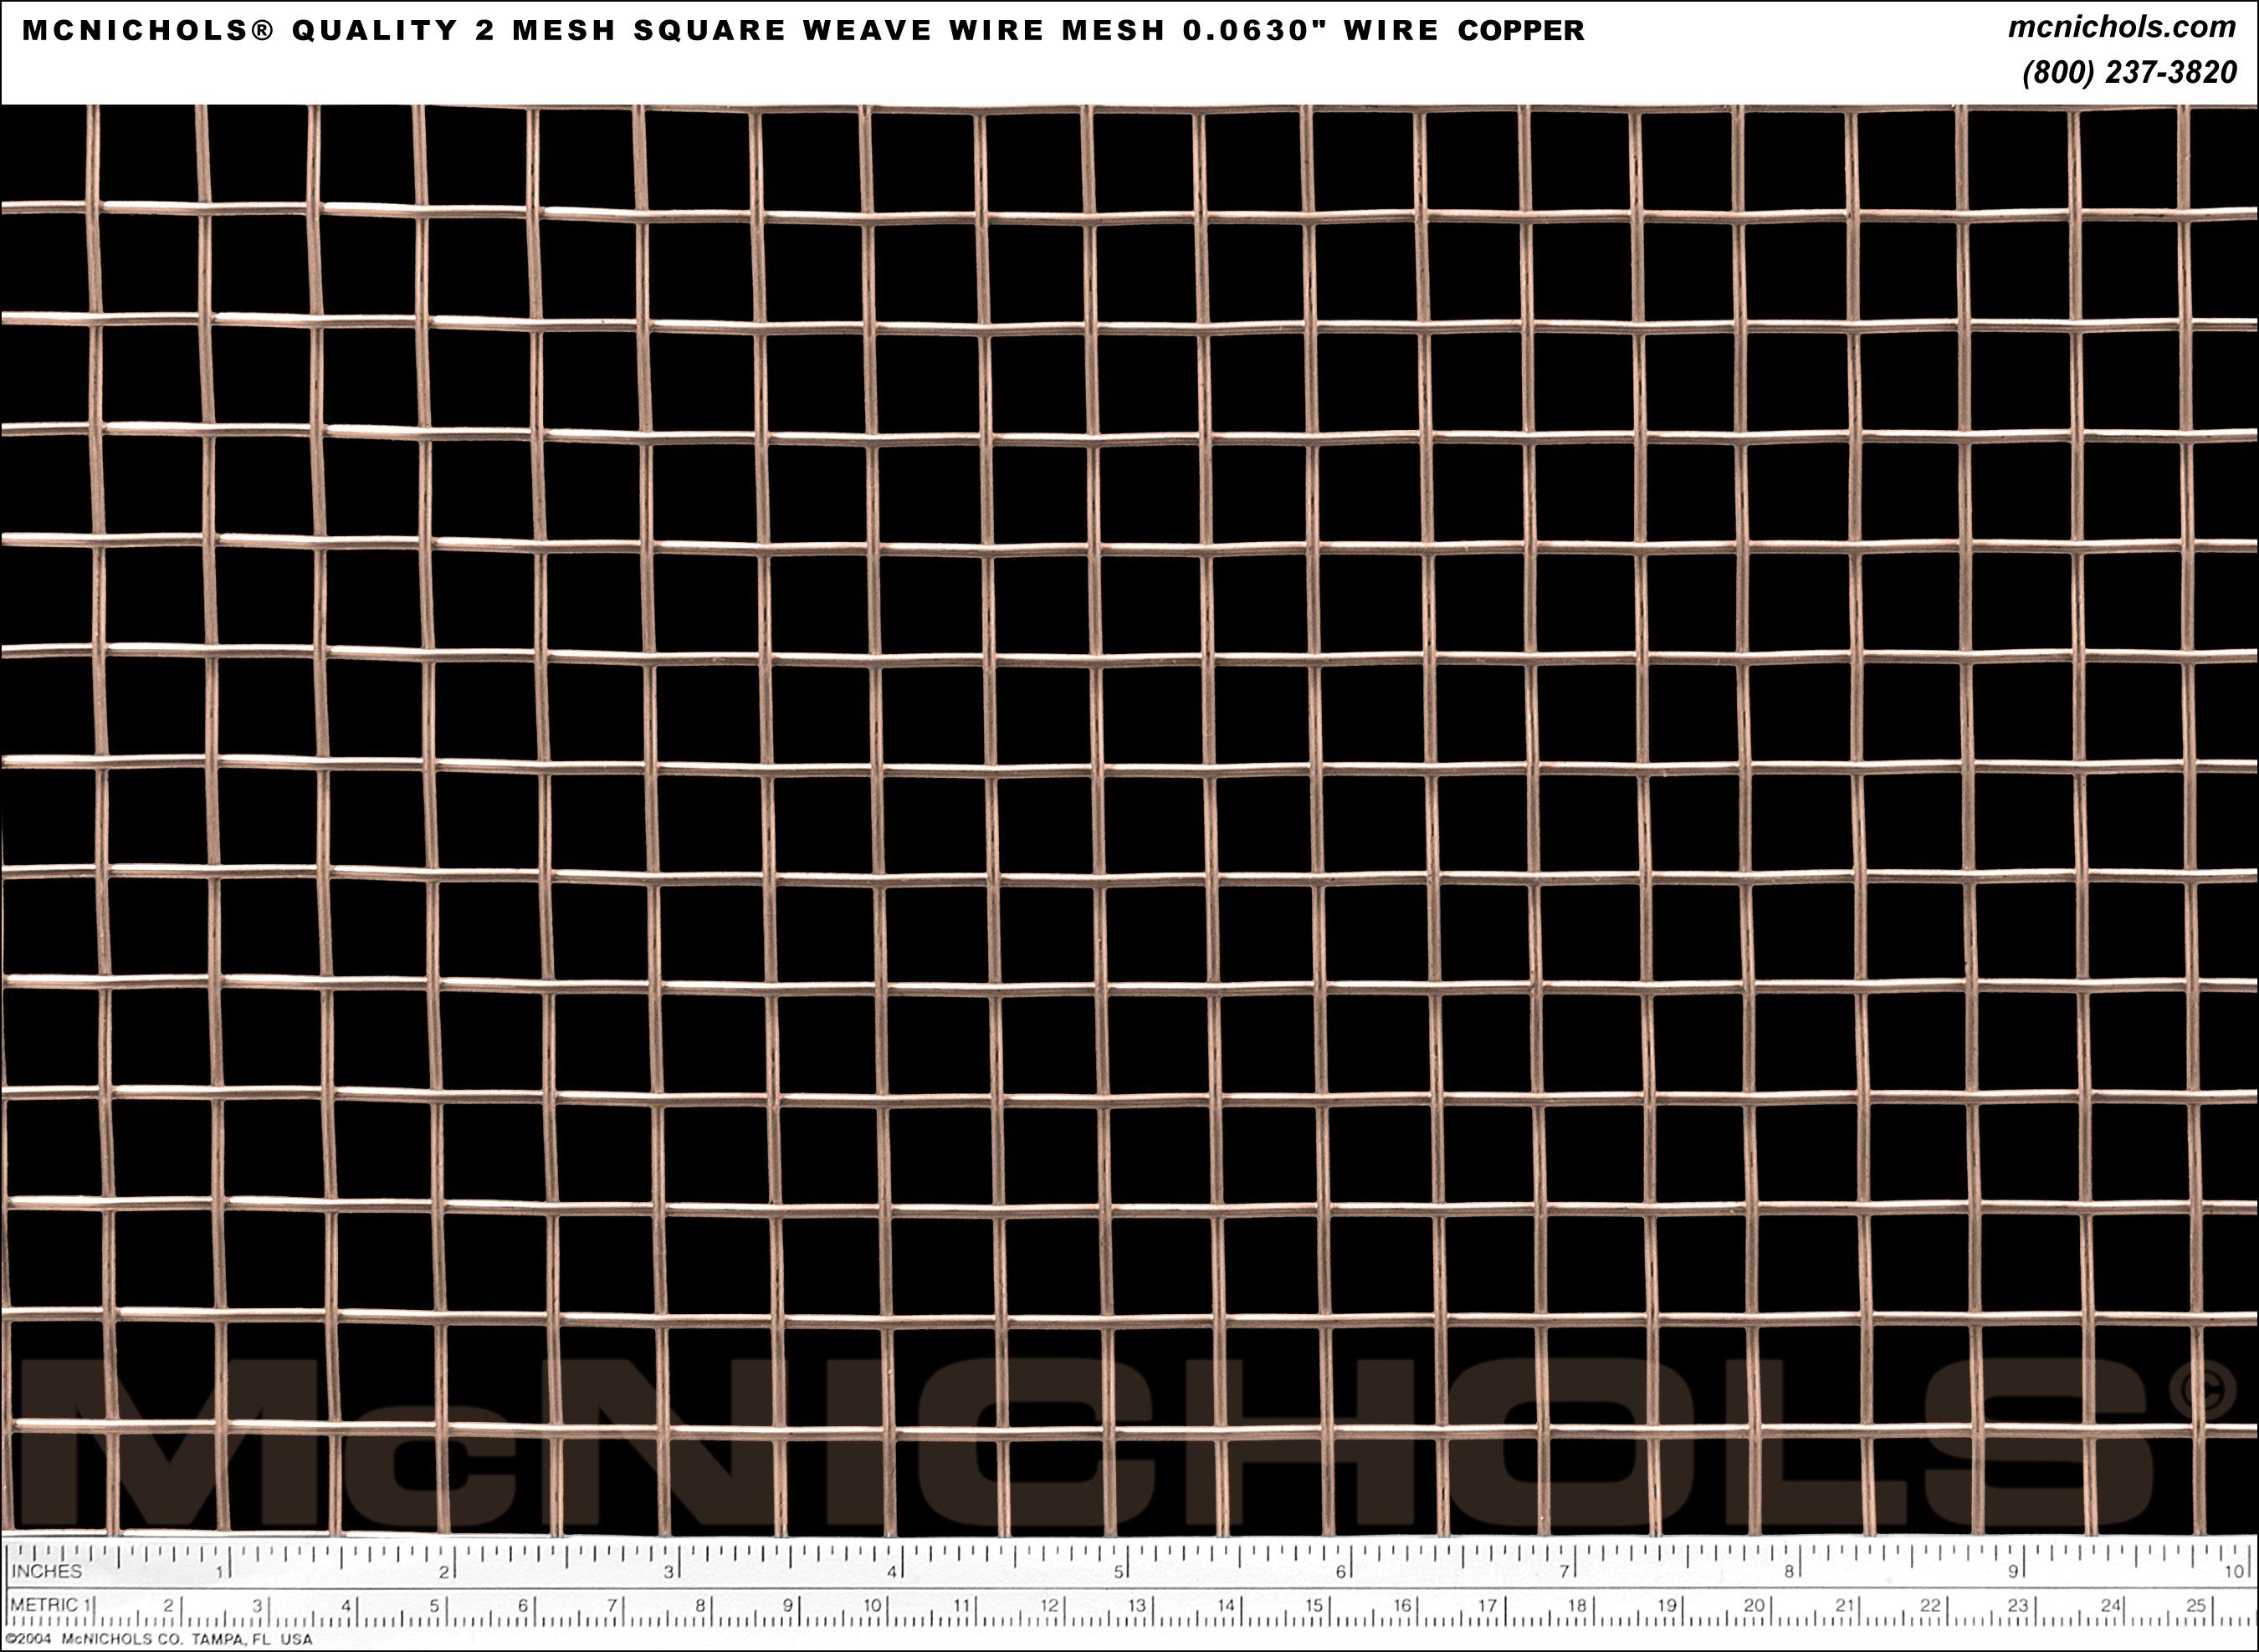 McNICHOLS Quality 2 Mesh Square Weave Wire Mesh, 0.0630\